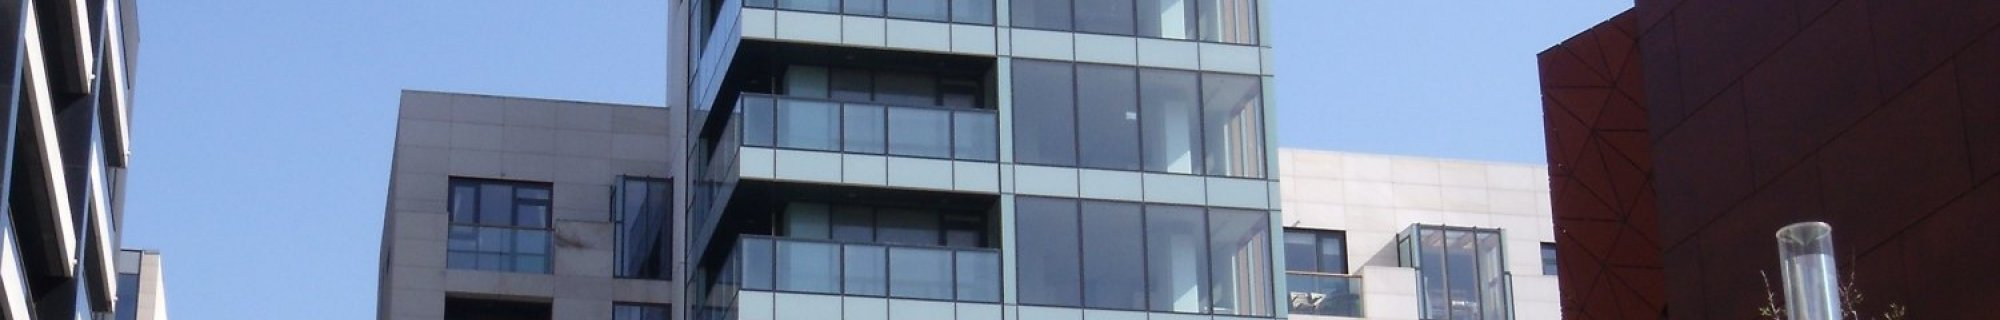 Sandyford Tall building